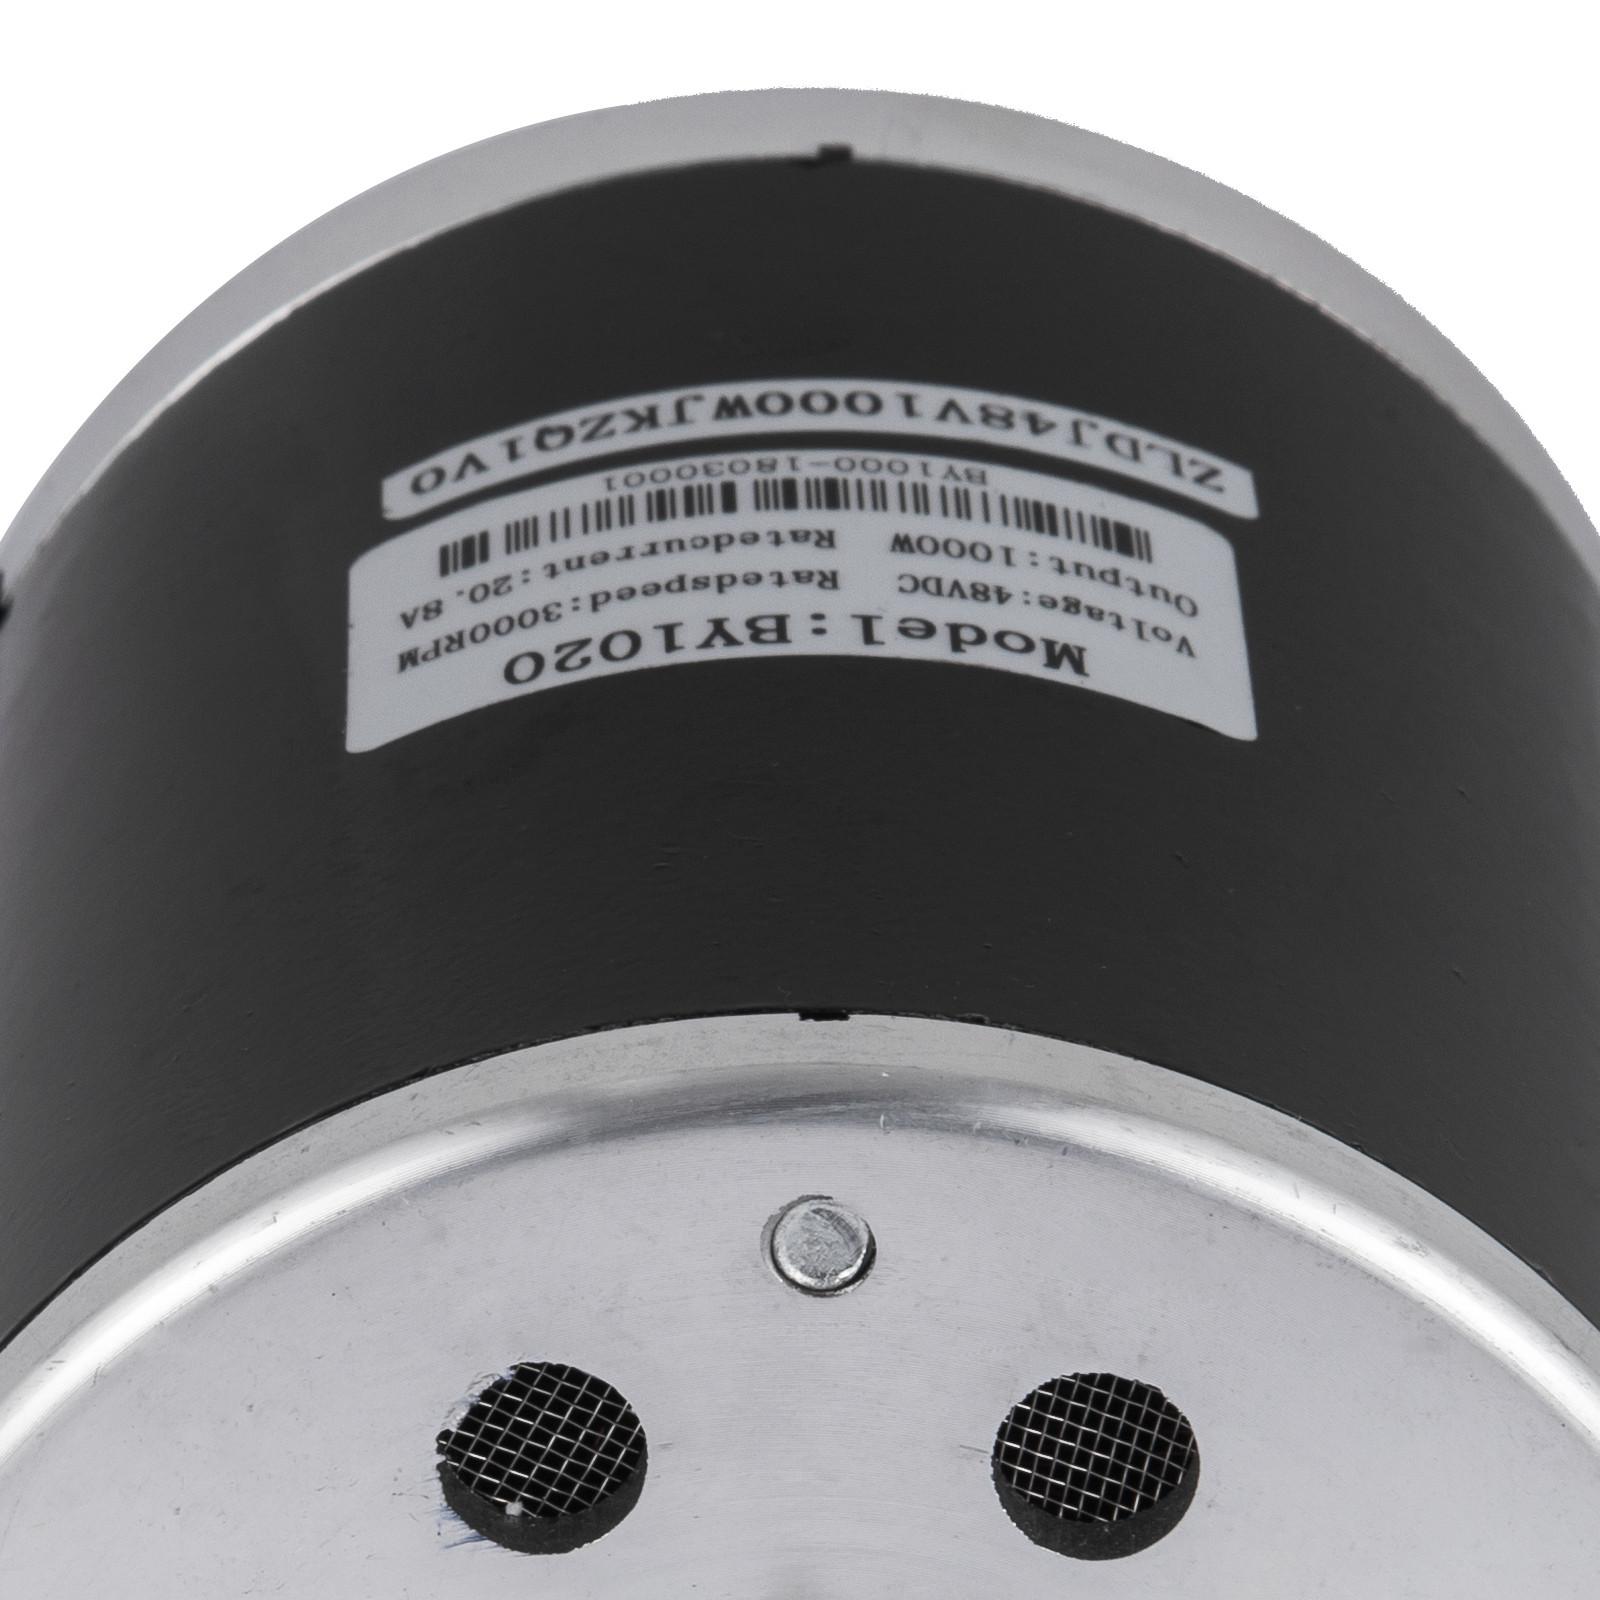 1800W-48V-DC-Brushless-Electric-Motor-Kit-f-Scooter-500-1800W-E-Bike-Go-Kart thumbnail 47